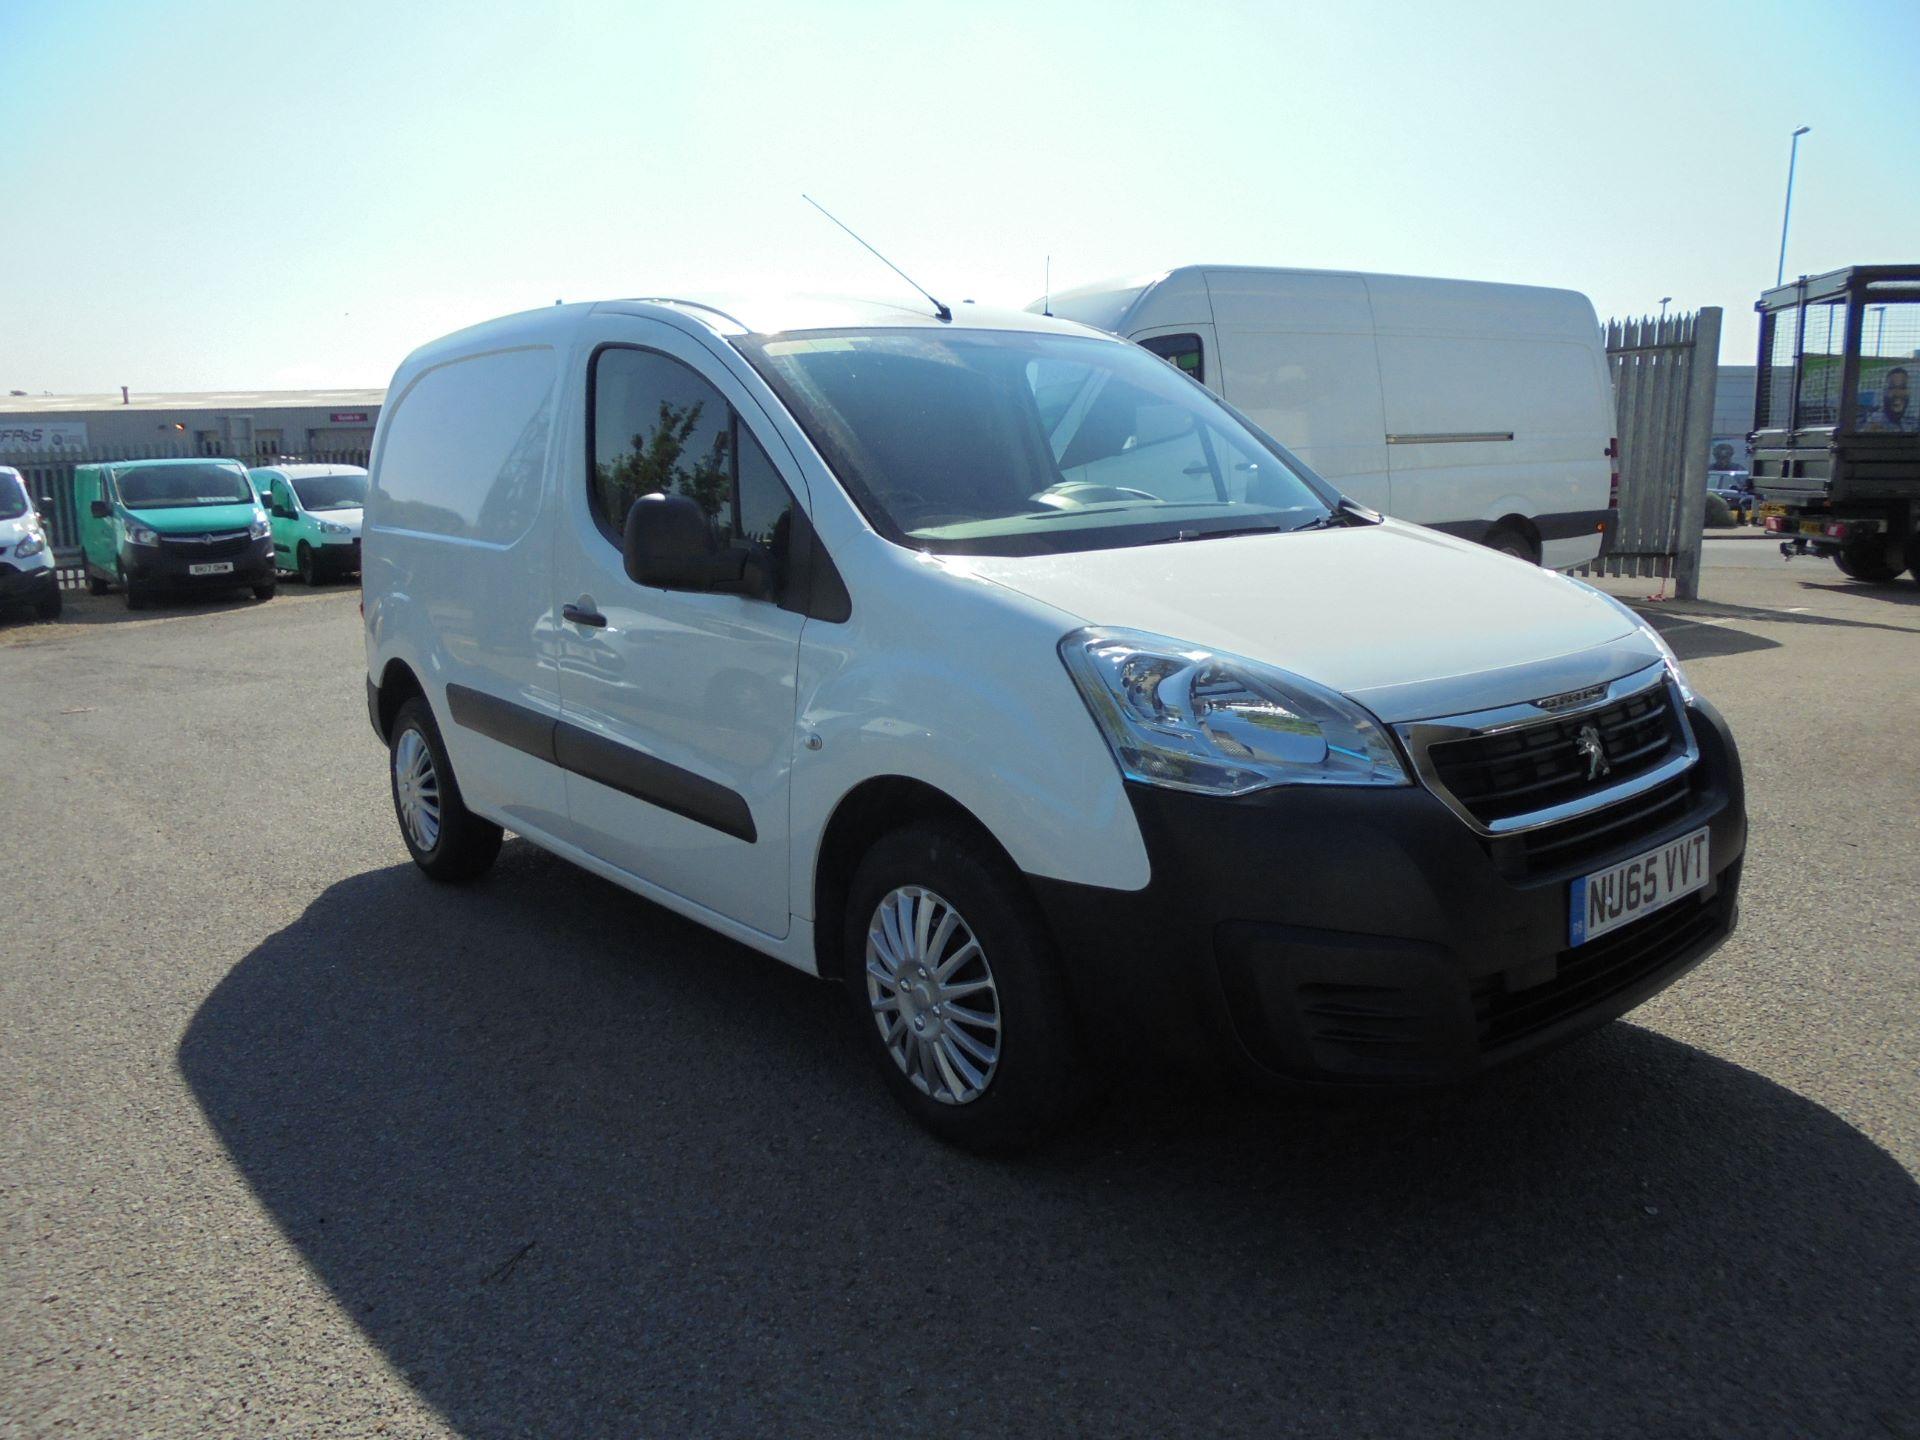 2015 Peugeot Partner L1 850 S 1.6 92PS (SLD) EURO 5 (NU65VVT)